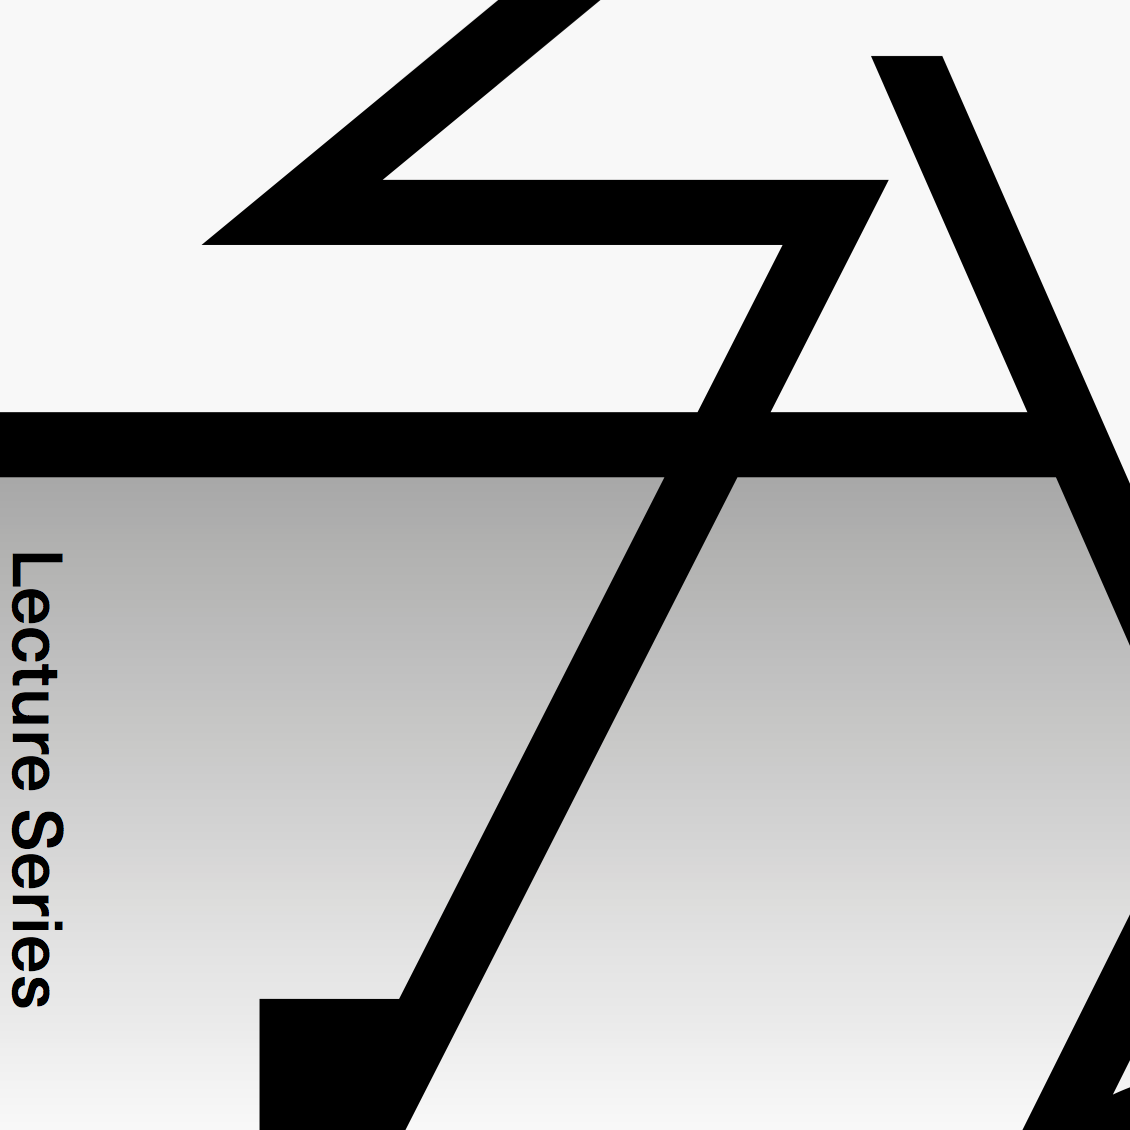 Basel School of Design